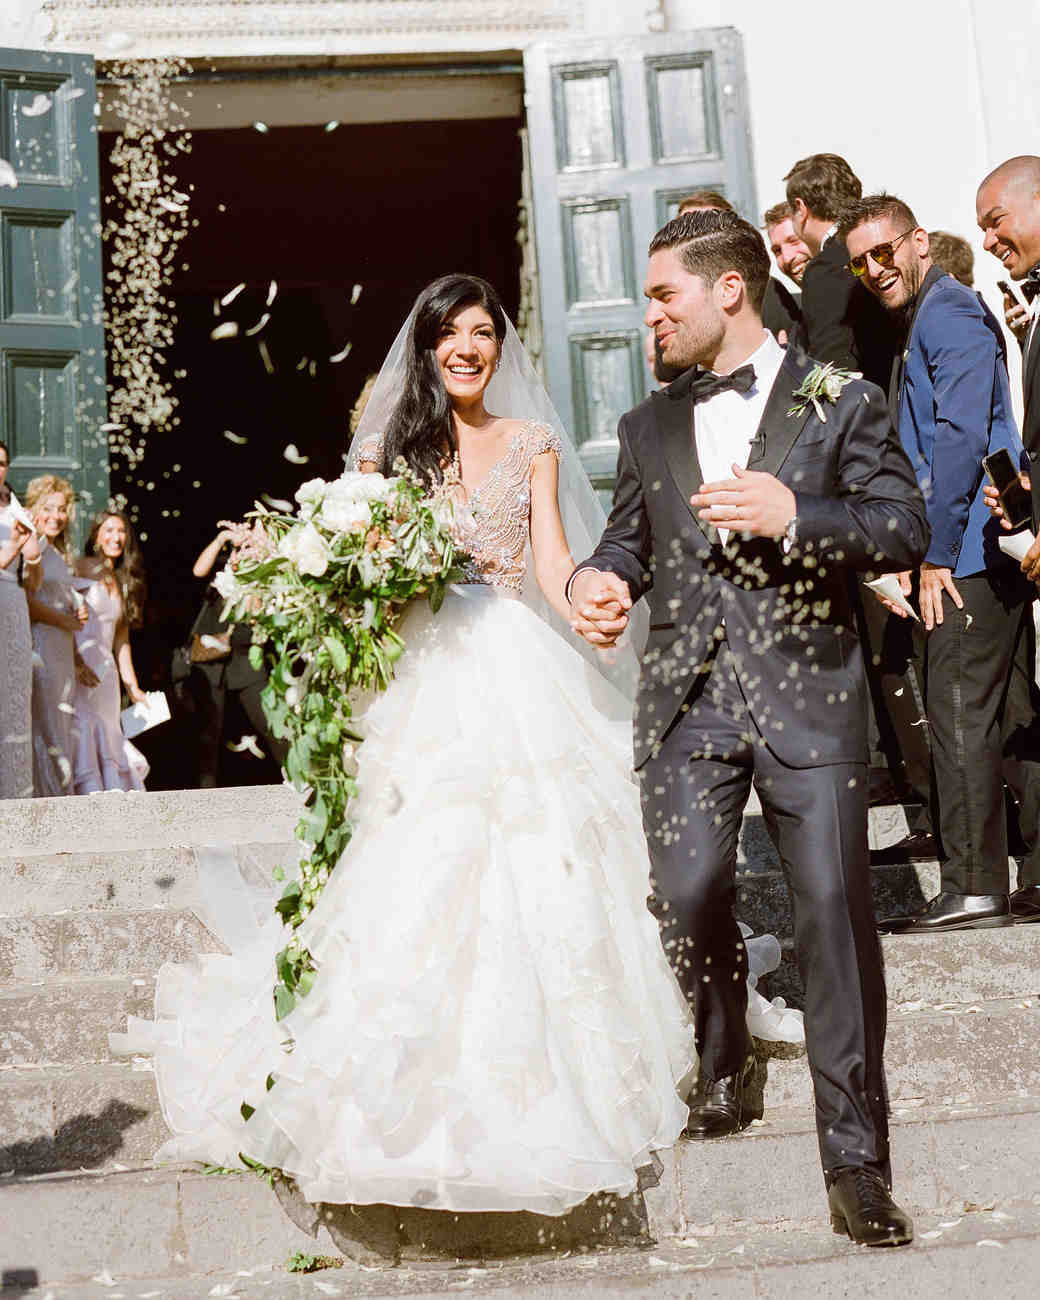 lisa-greg-italy-wedding-recessional-church-103312970_vert.jpg